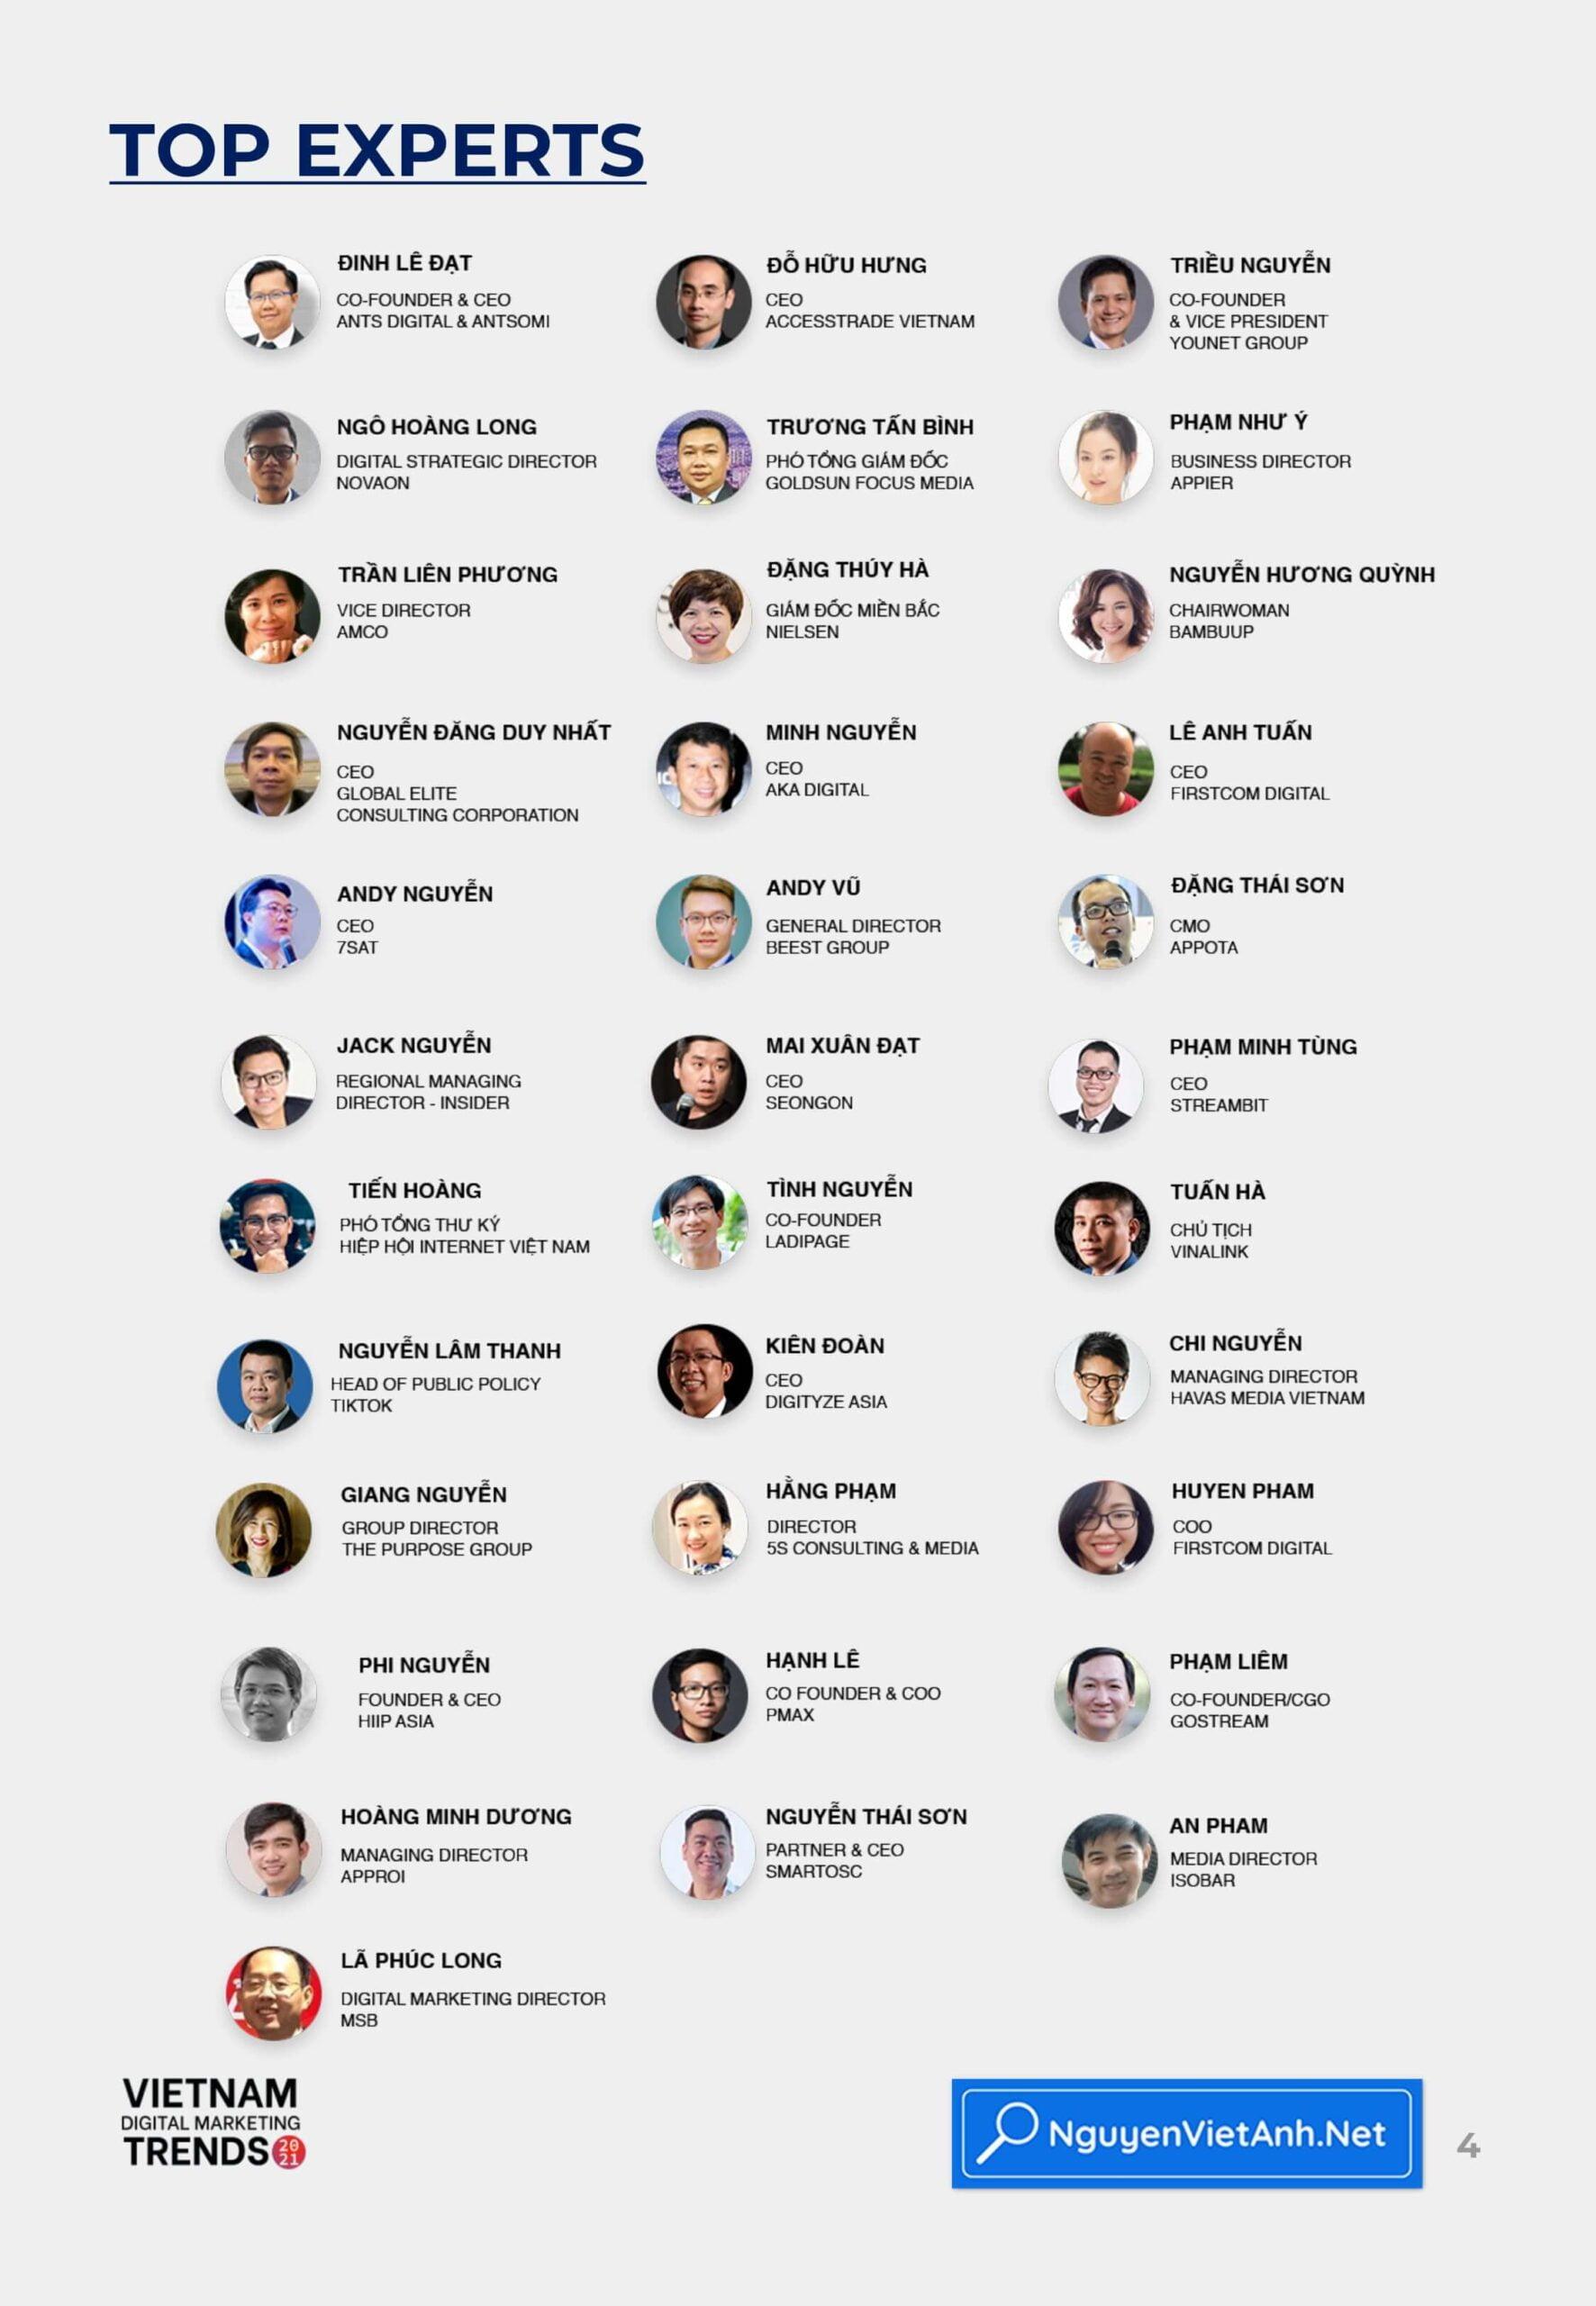 Vietnam Digital Marketing Trends 2021 - Top Experts